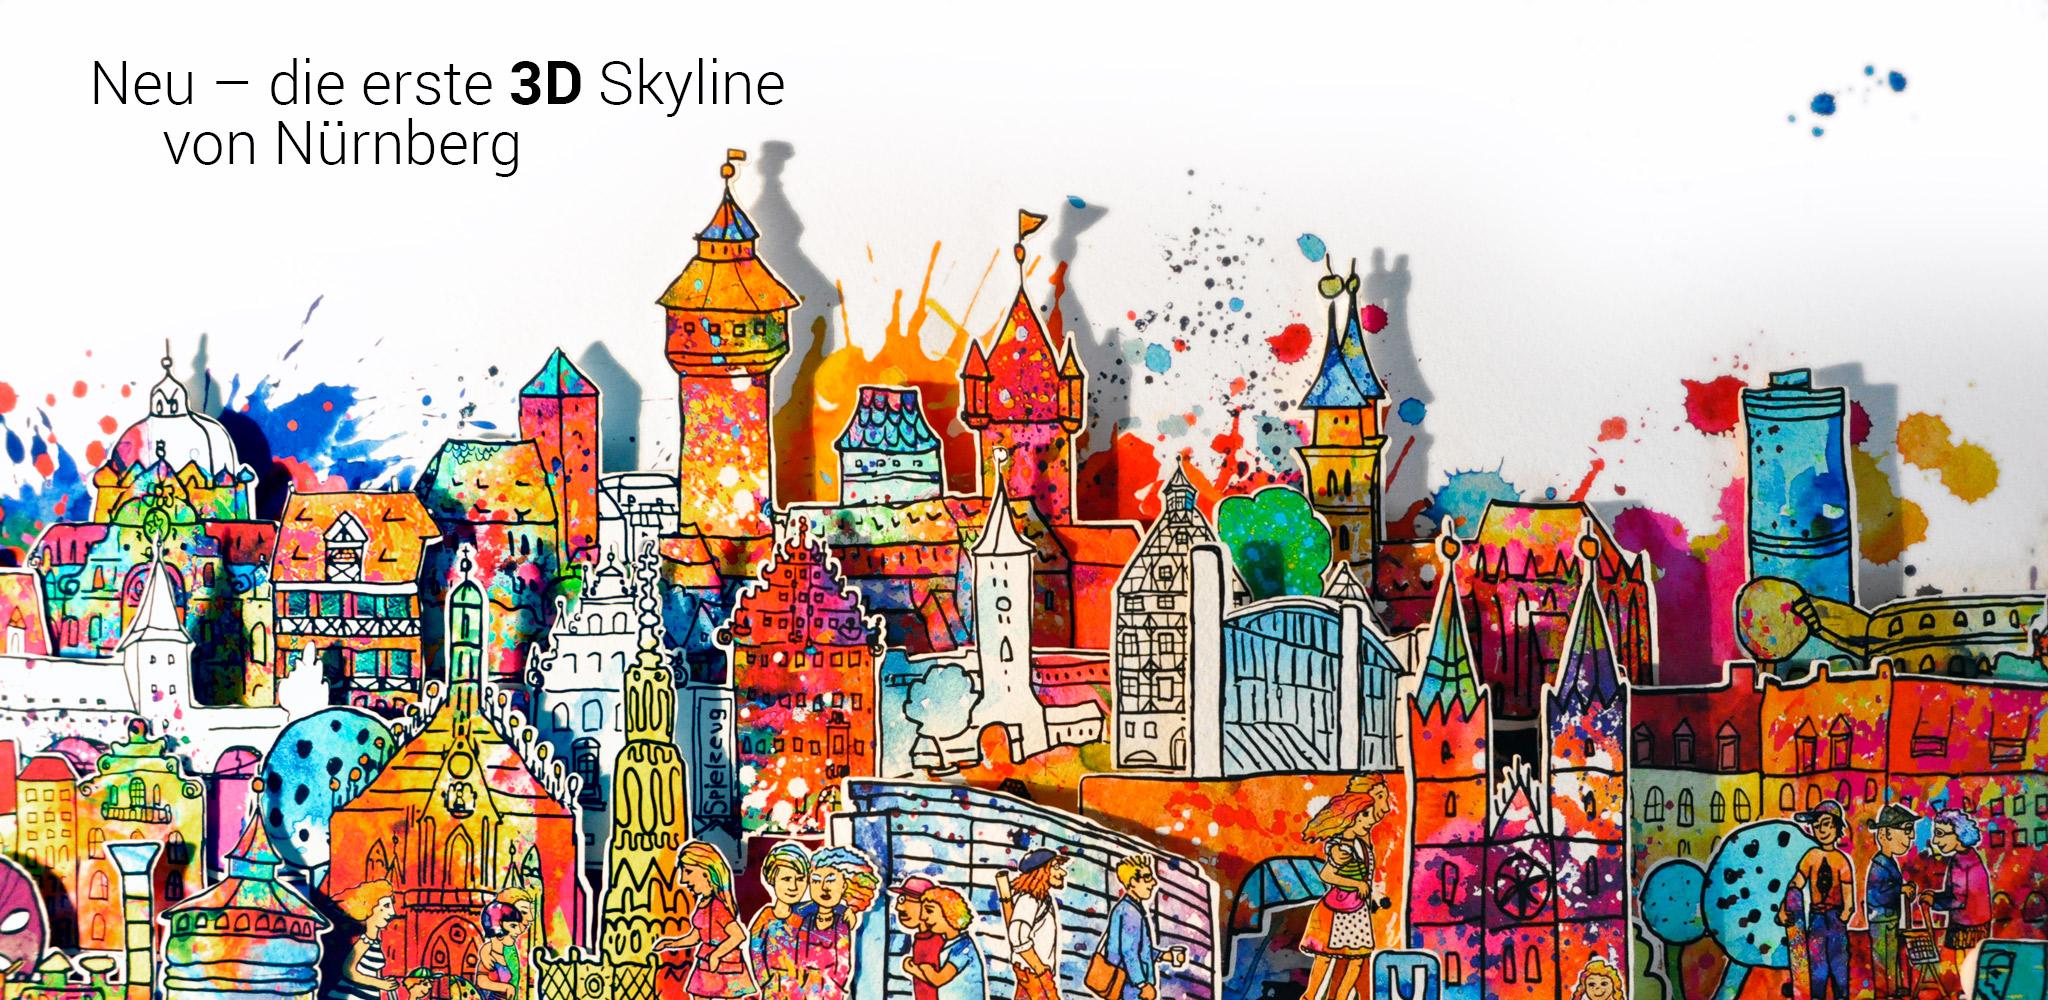 birgit_osten_skyline_3D